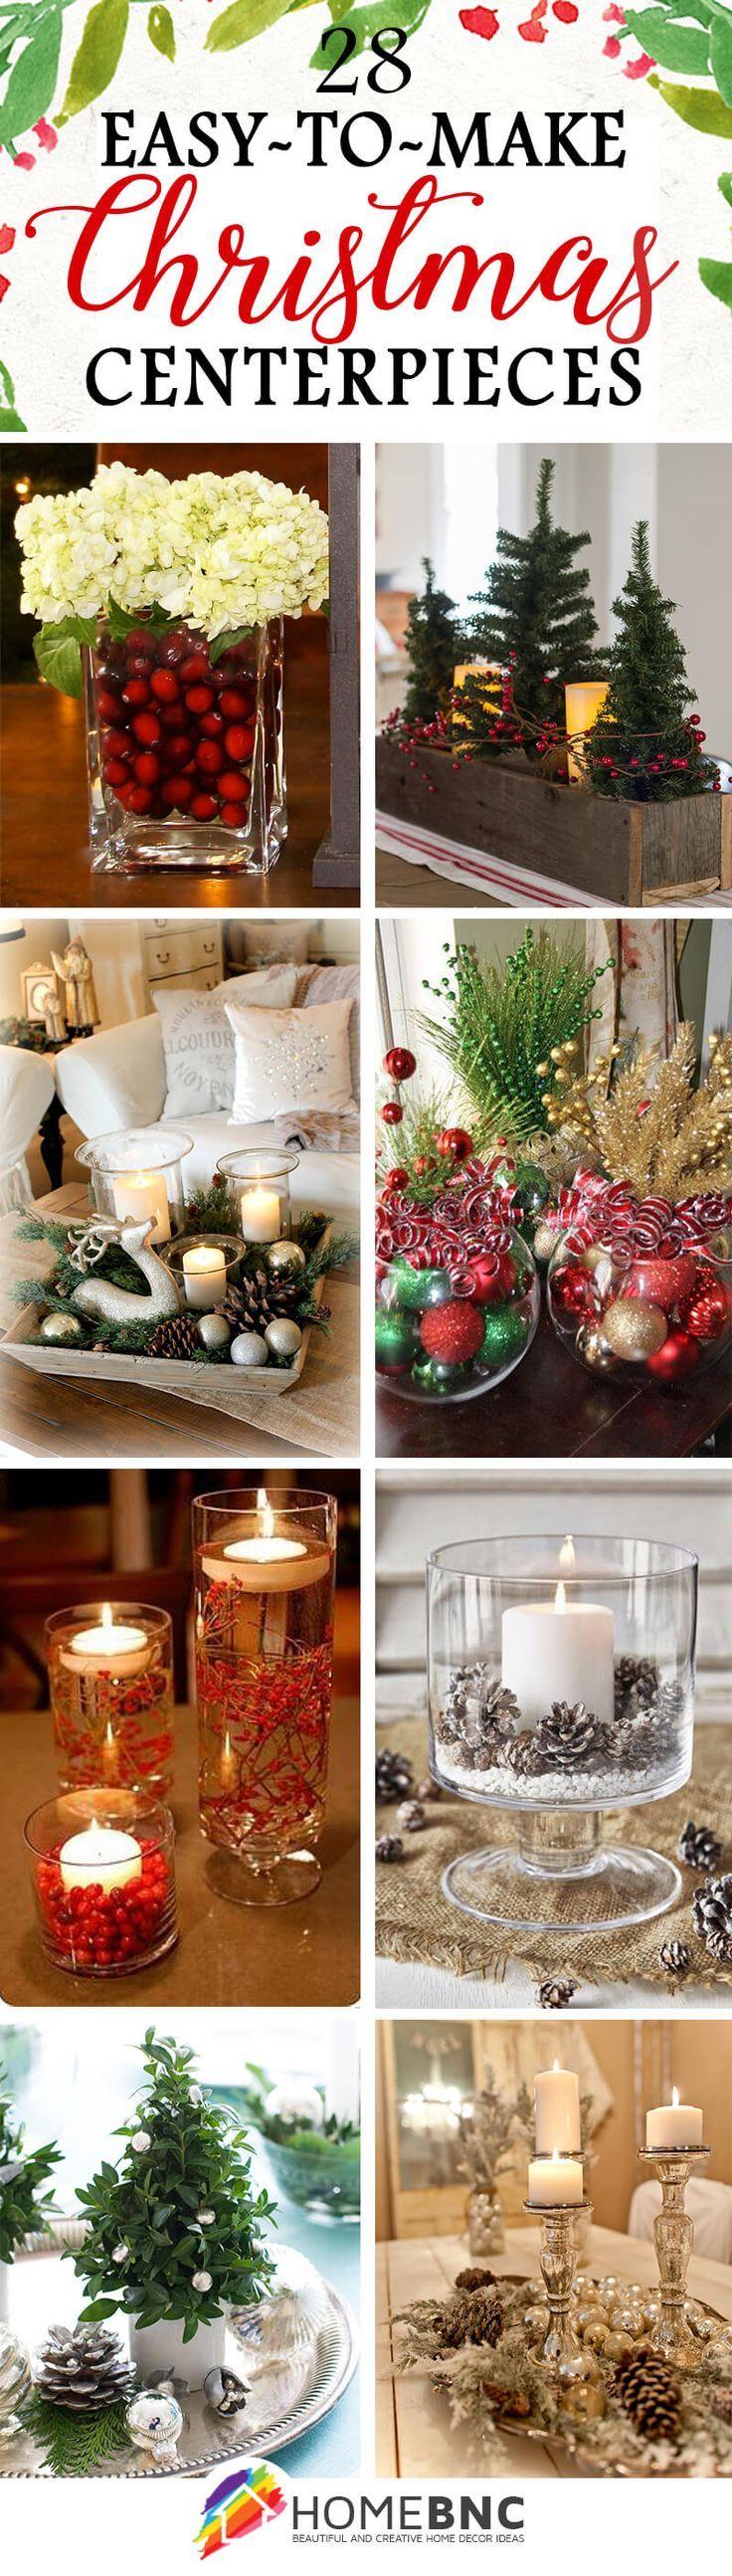 28 fabulous diy christmas centerpieces that anyone can make 28 fabulous diy christmas centerpieces that anyone can make solutioingenieria Image collections